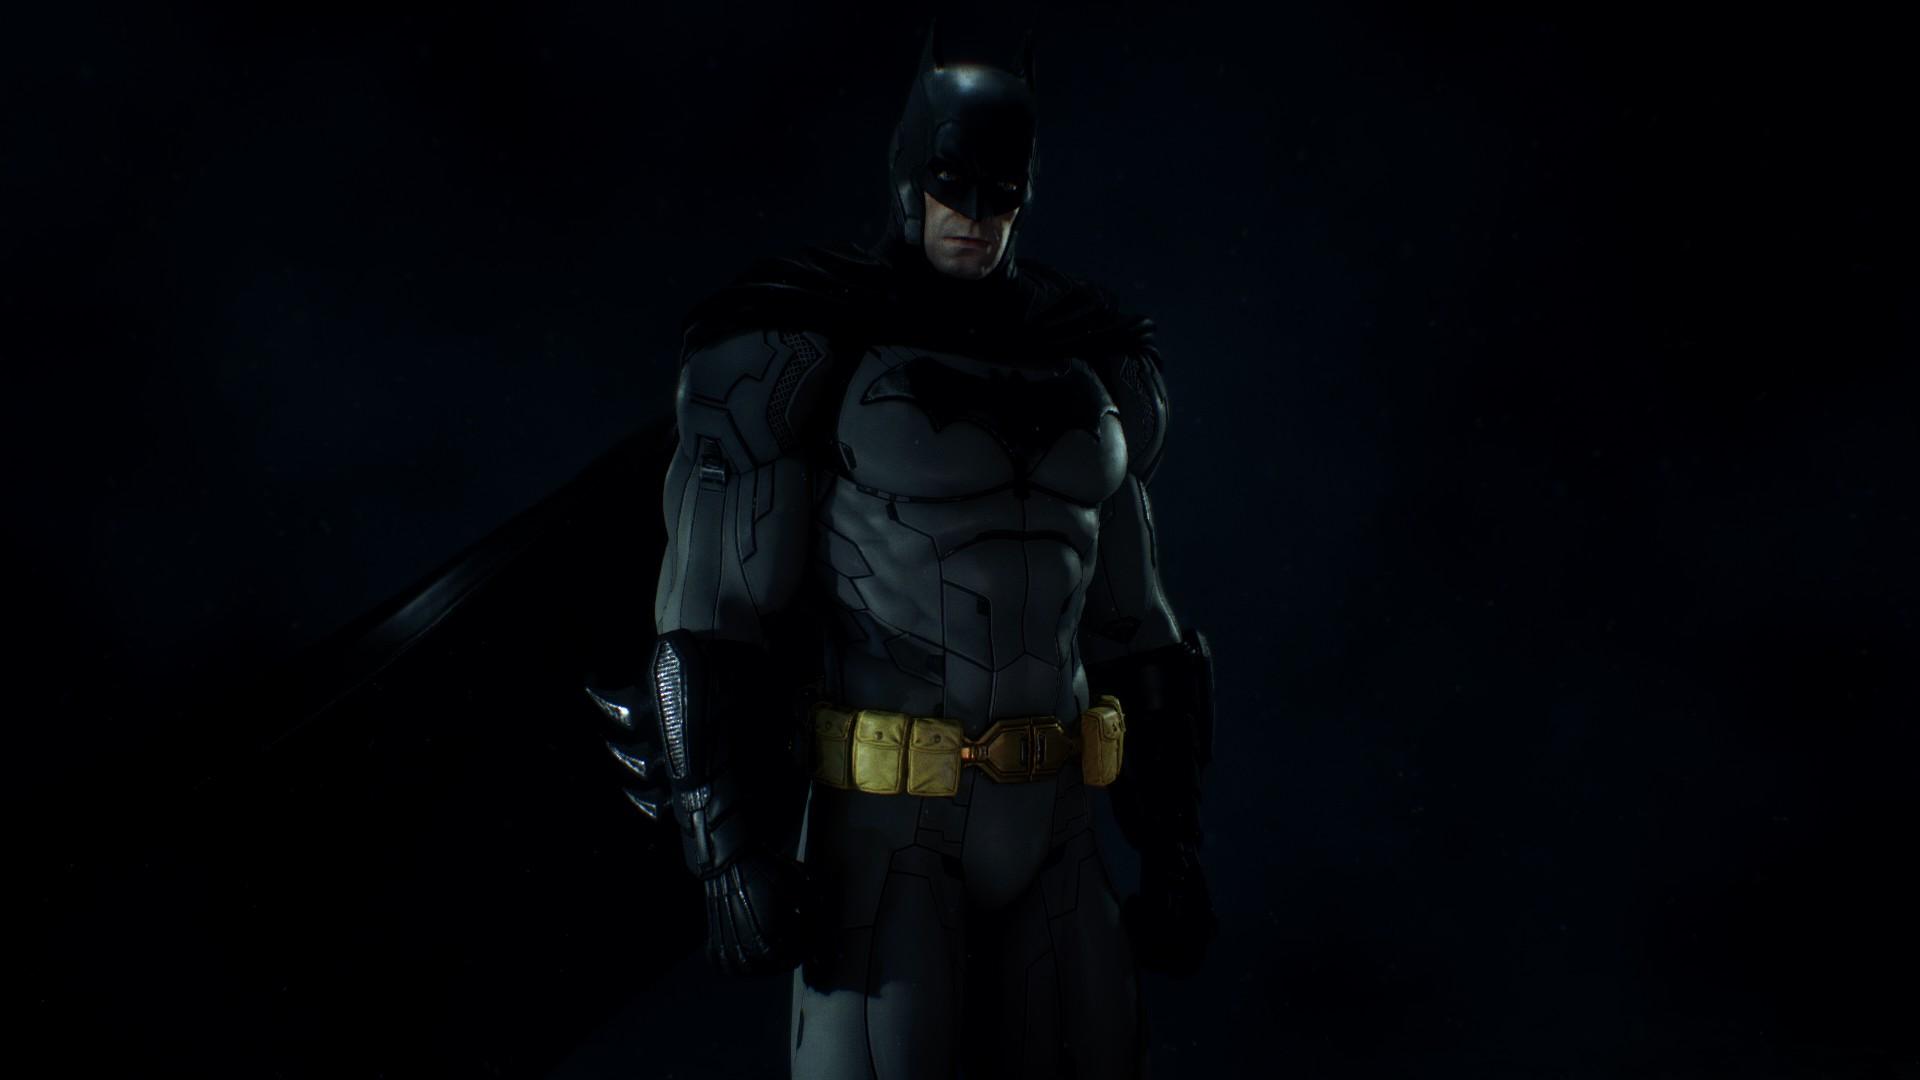 Fondos De Pantalla 1920x1080 Px Ordenanza Batman Arkham